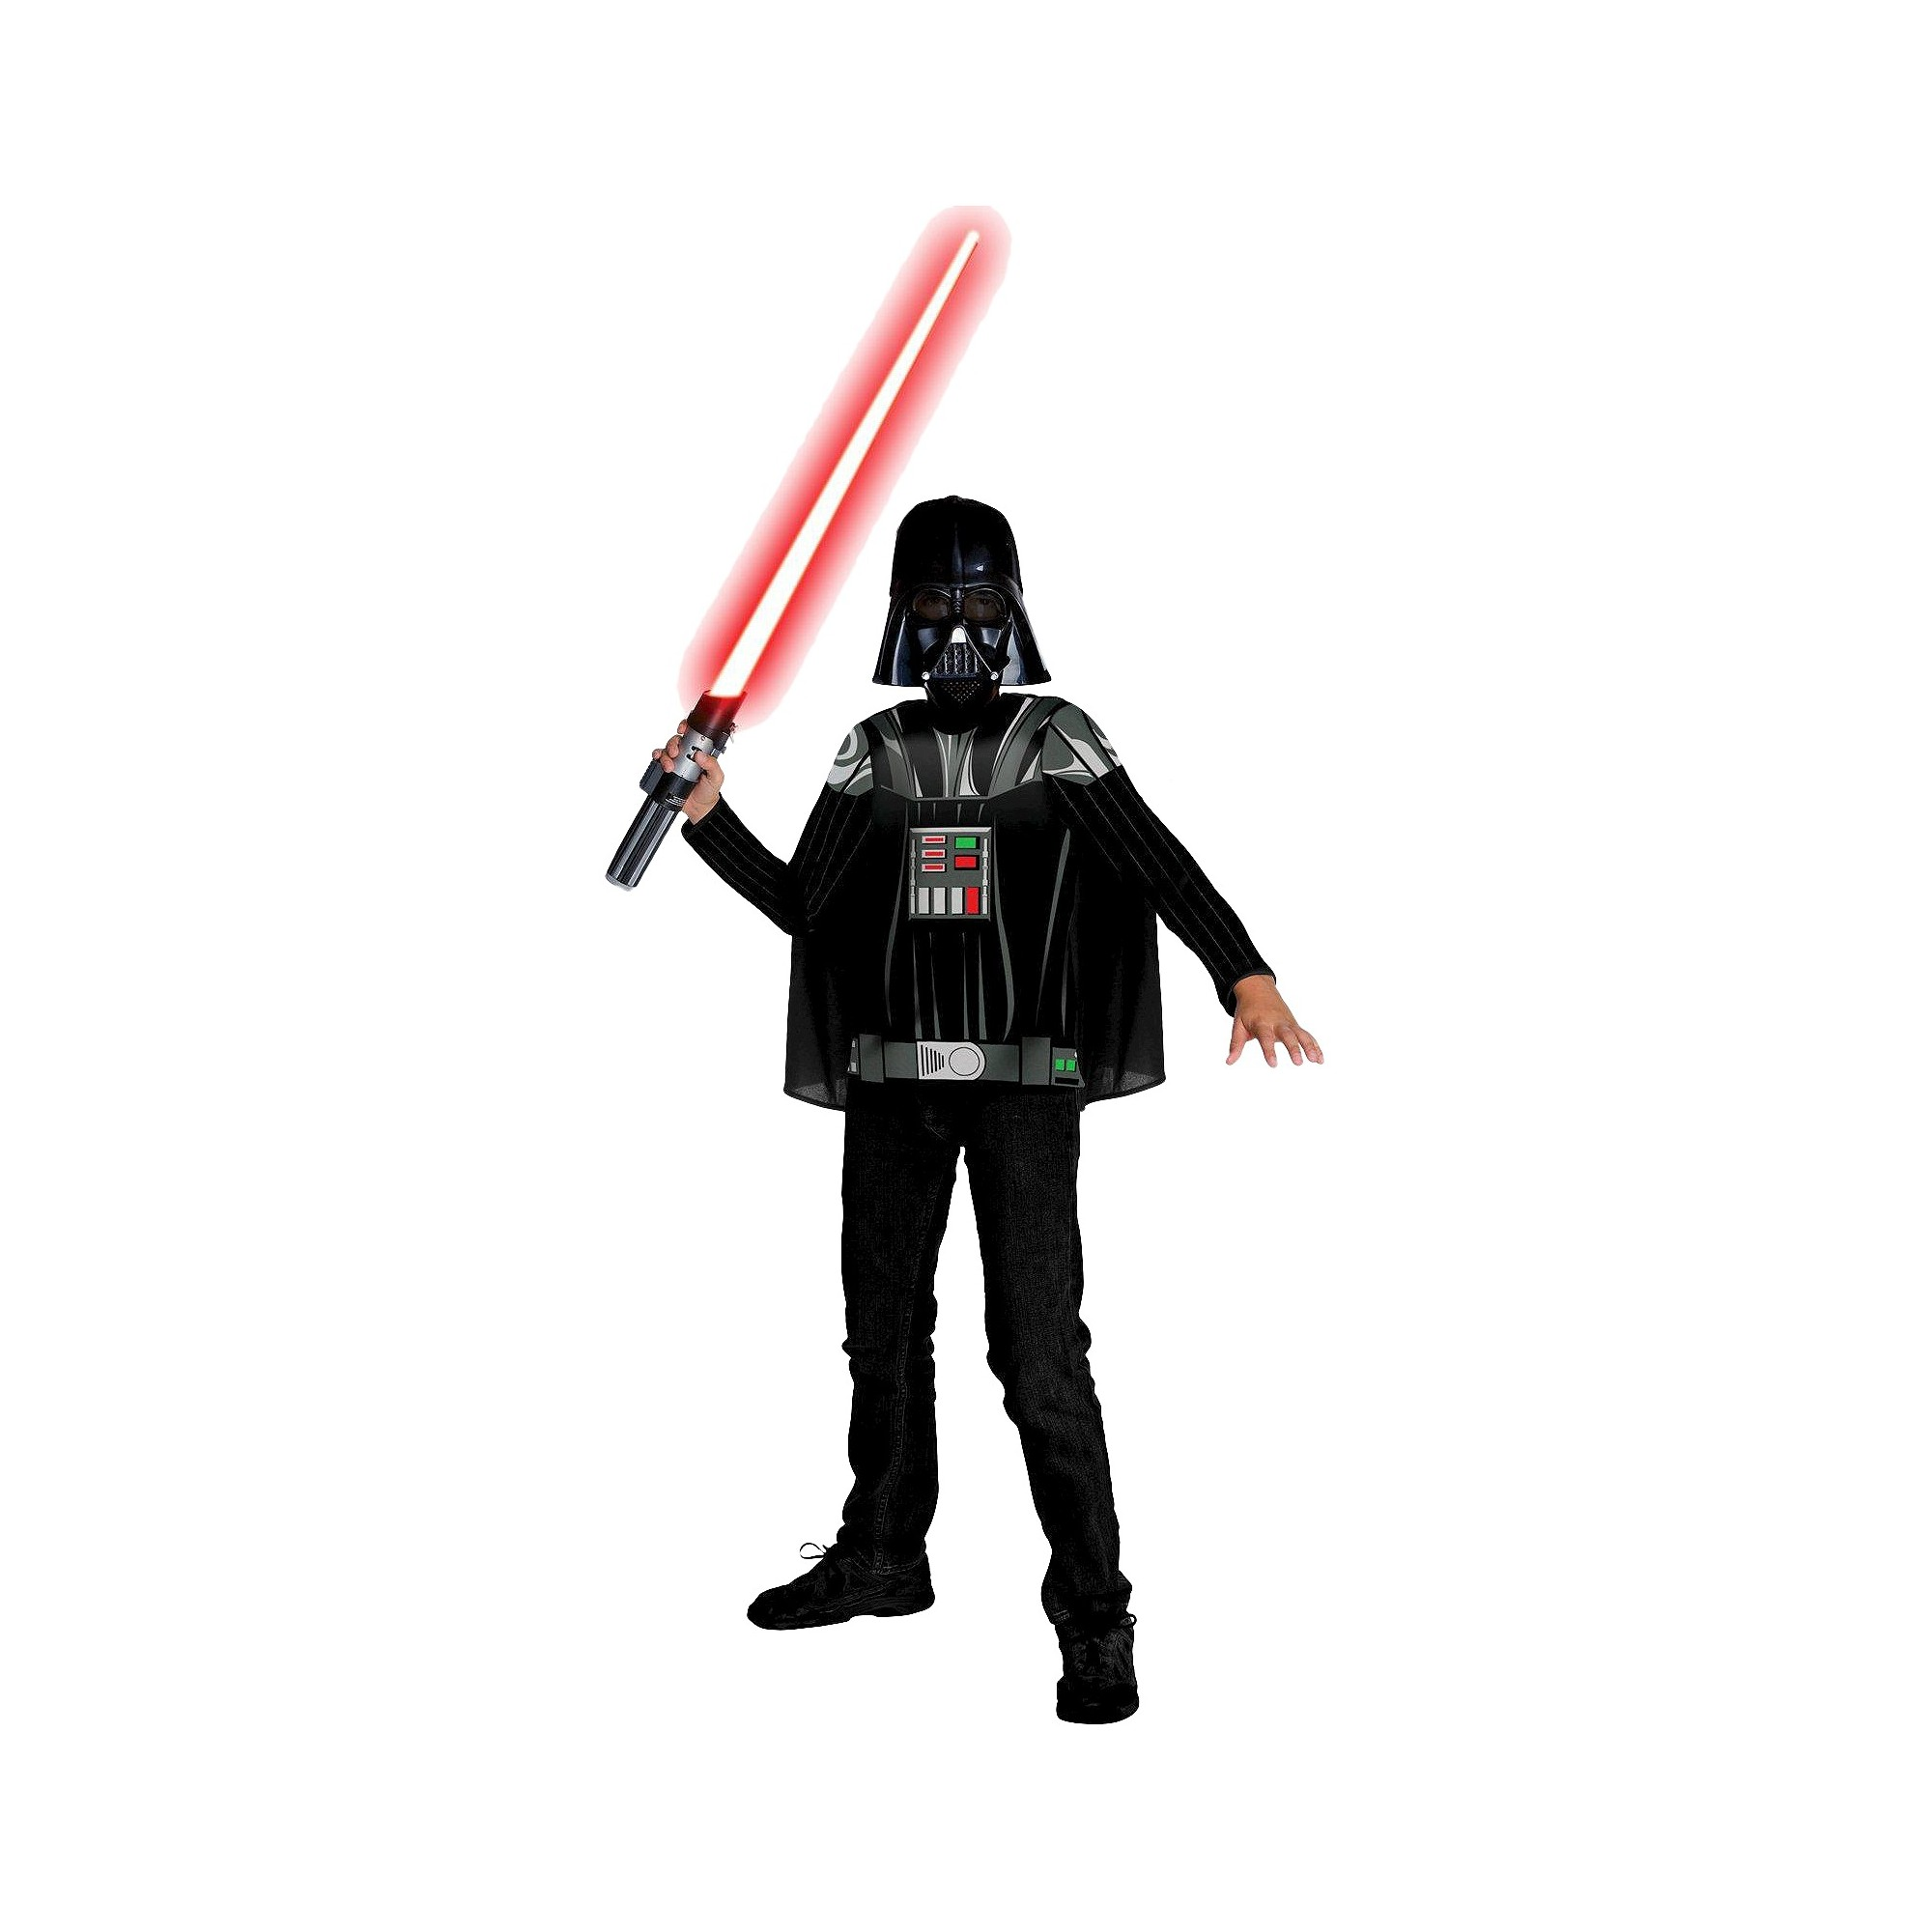 Star Wars Darth Vader Boys' Costume Small (4-6), Size: S(4-6), Black